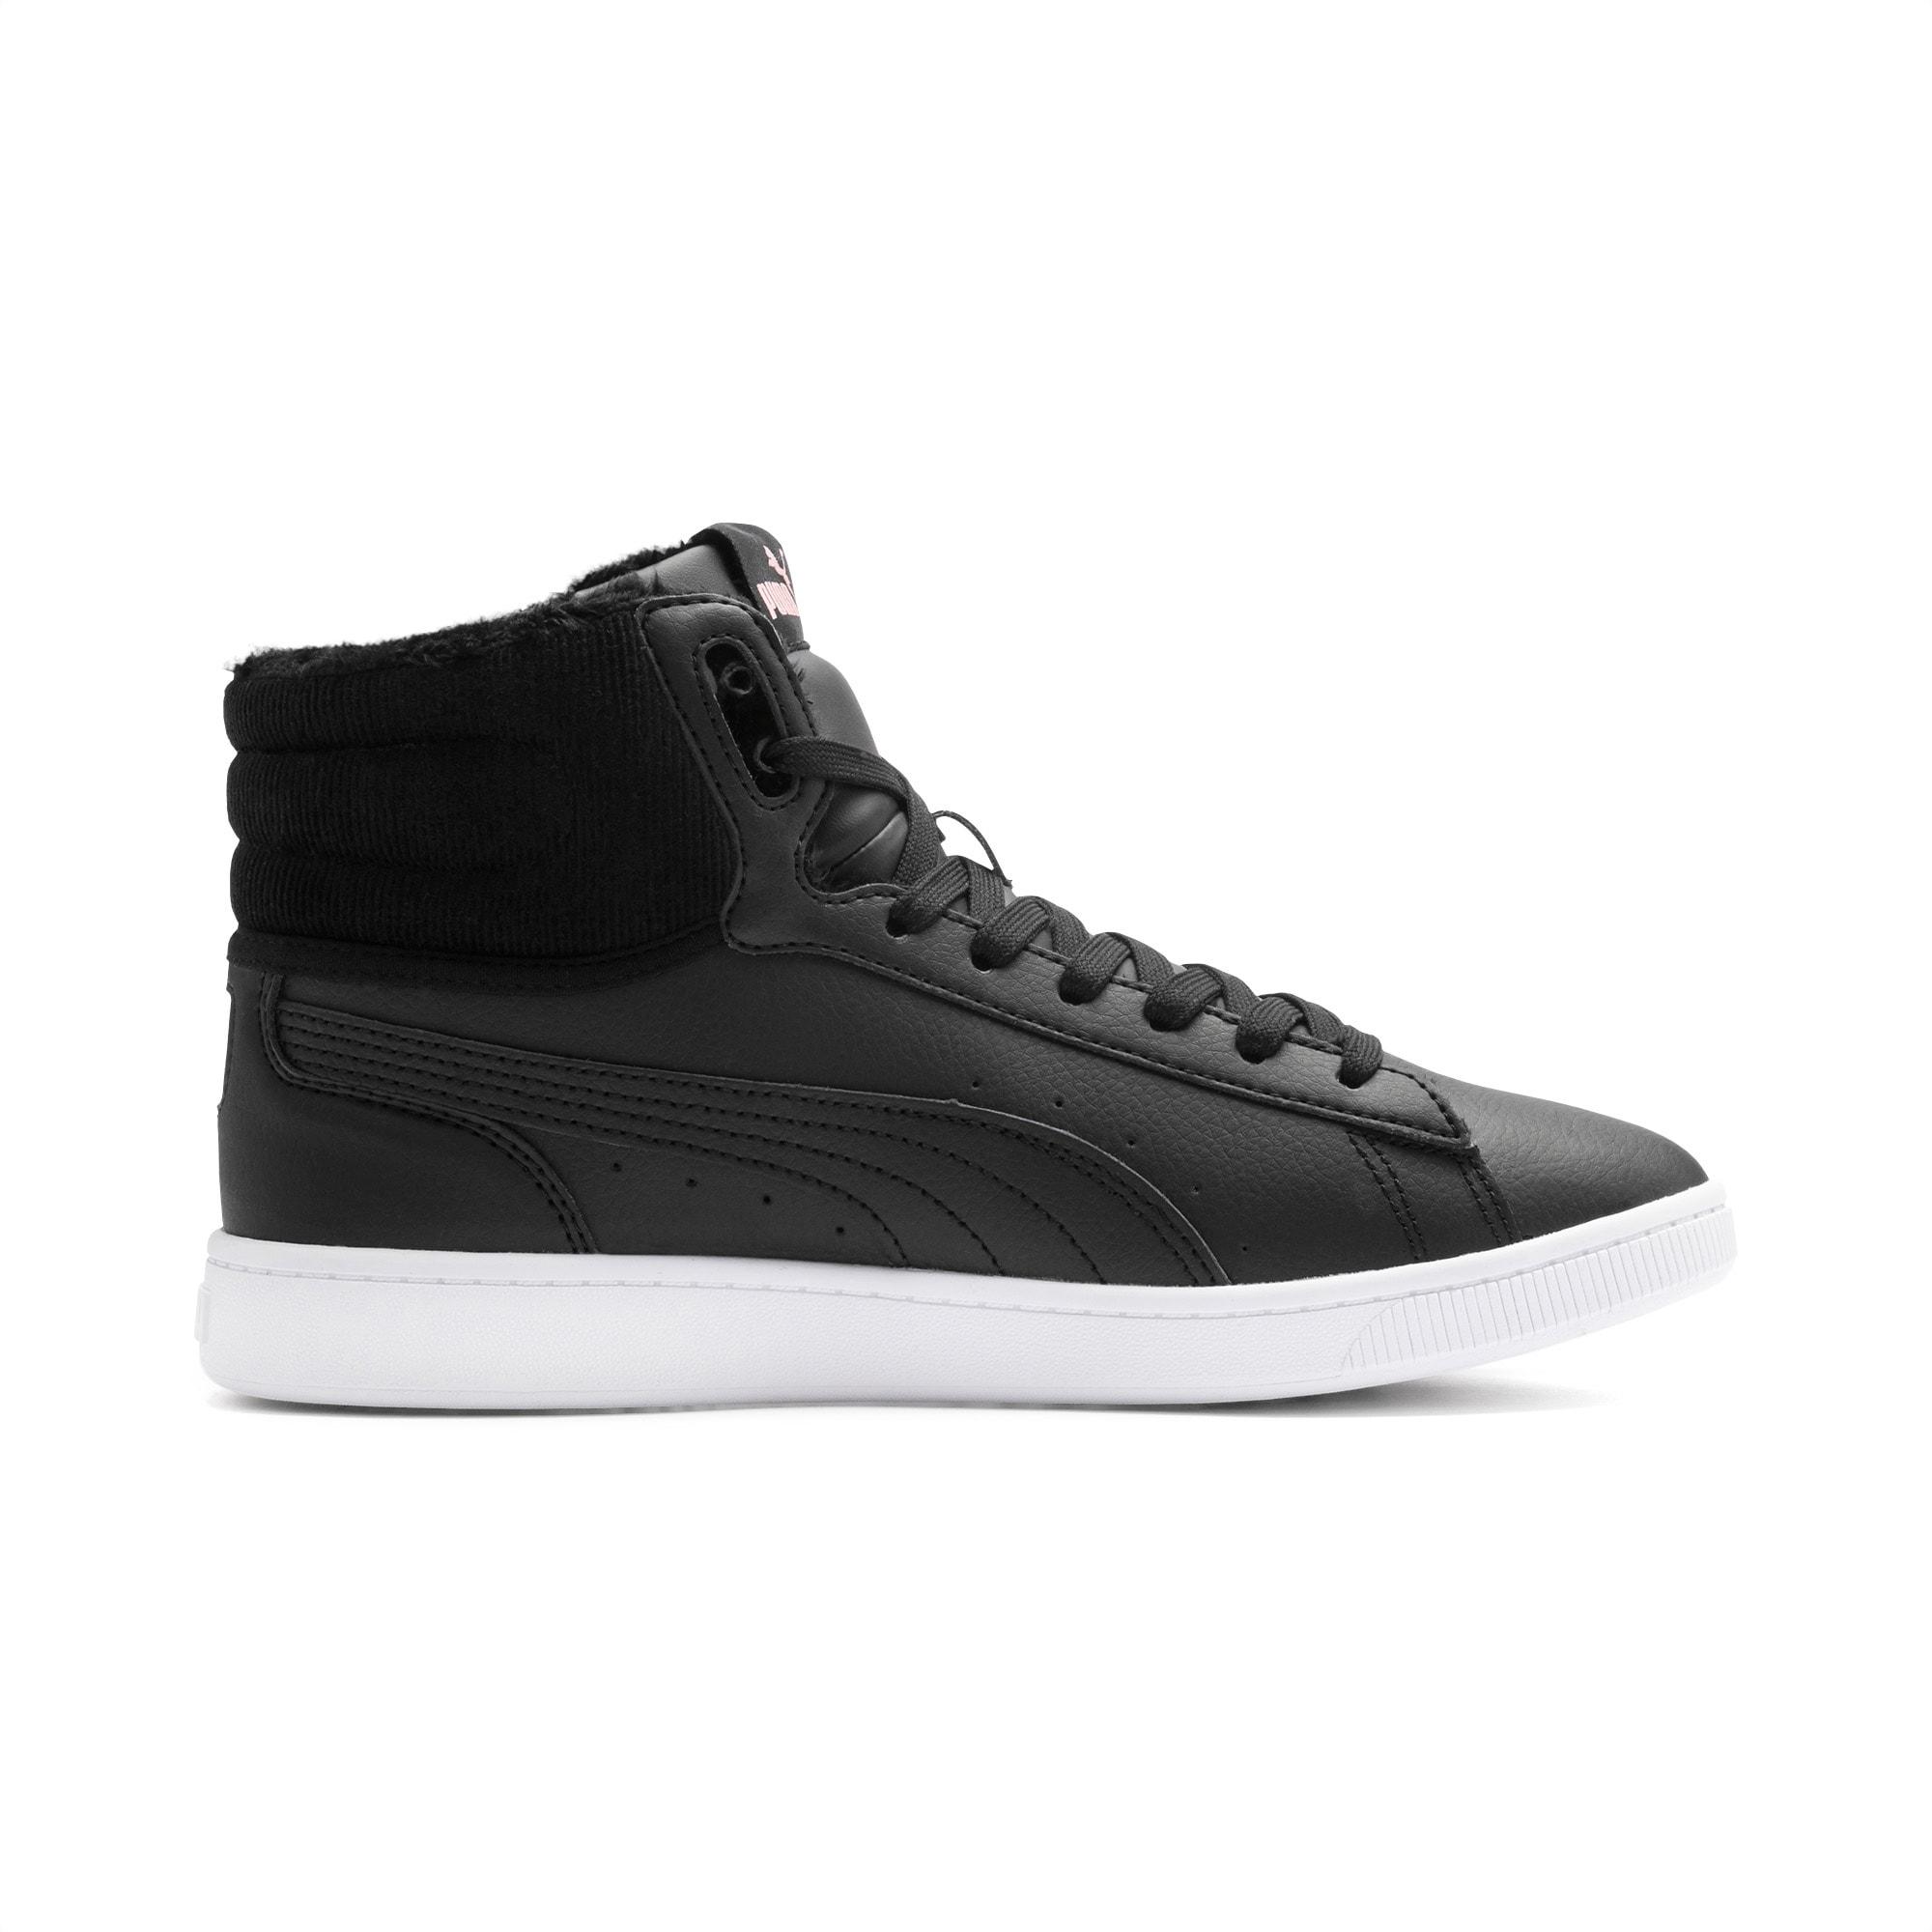 Vikky v2 mittelhoher Damen Winter Sneaker | Puma Black